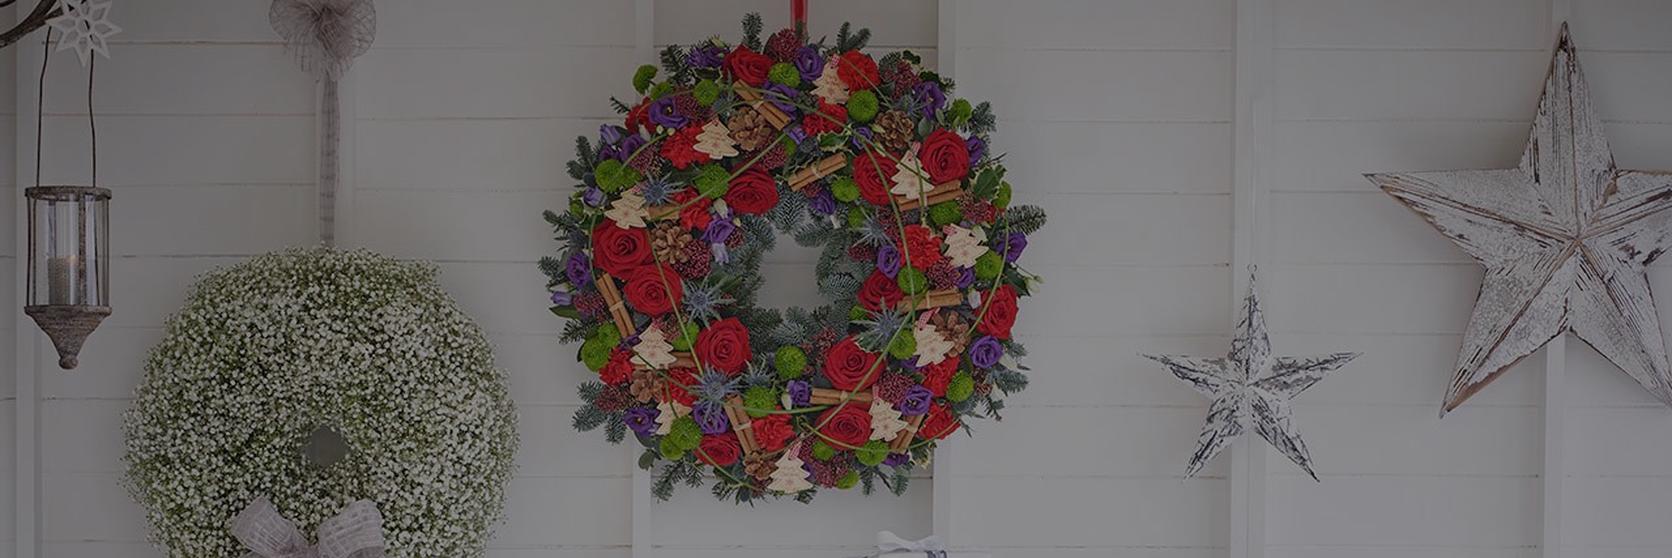 Inflo180416-Wreath_PR_1a